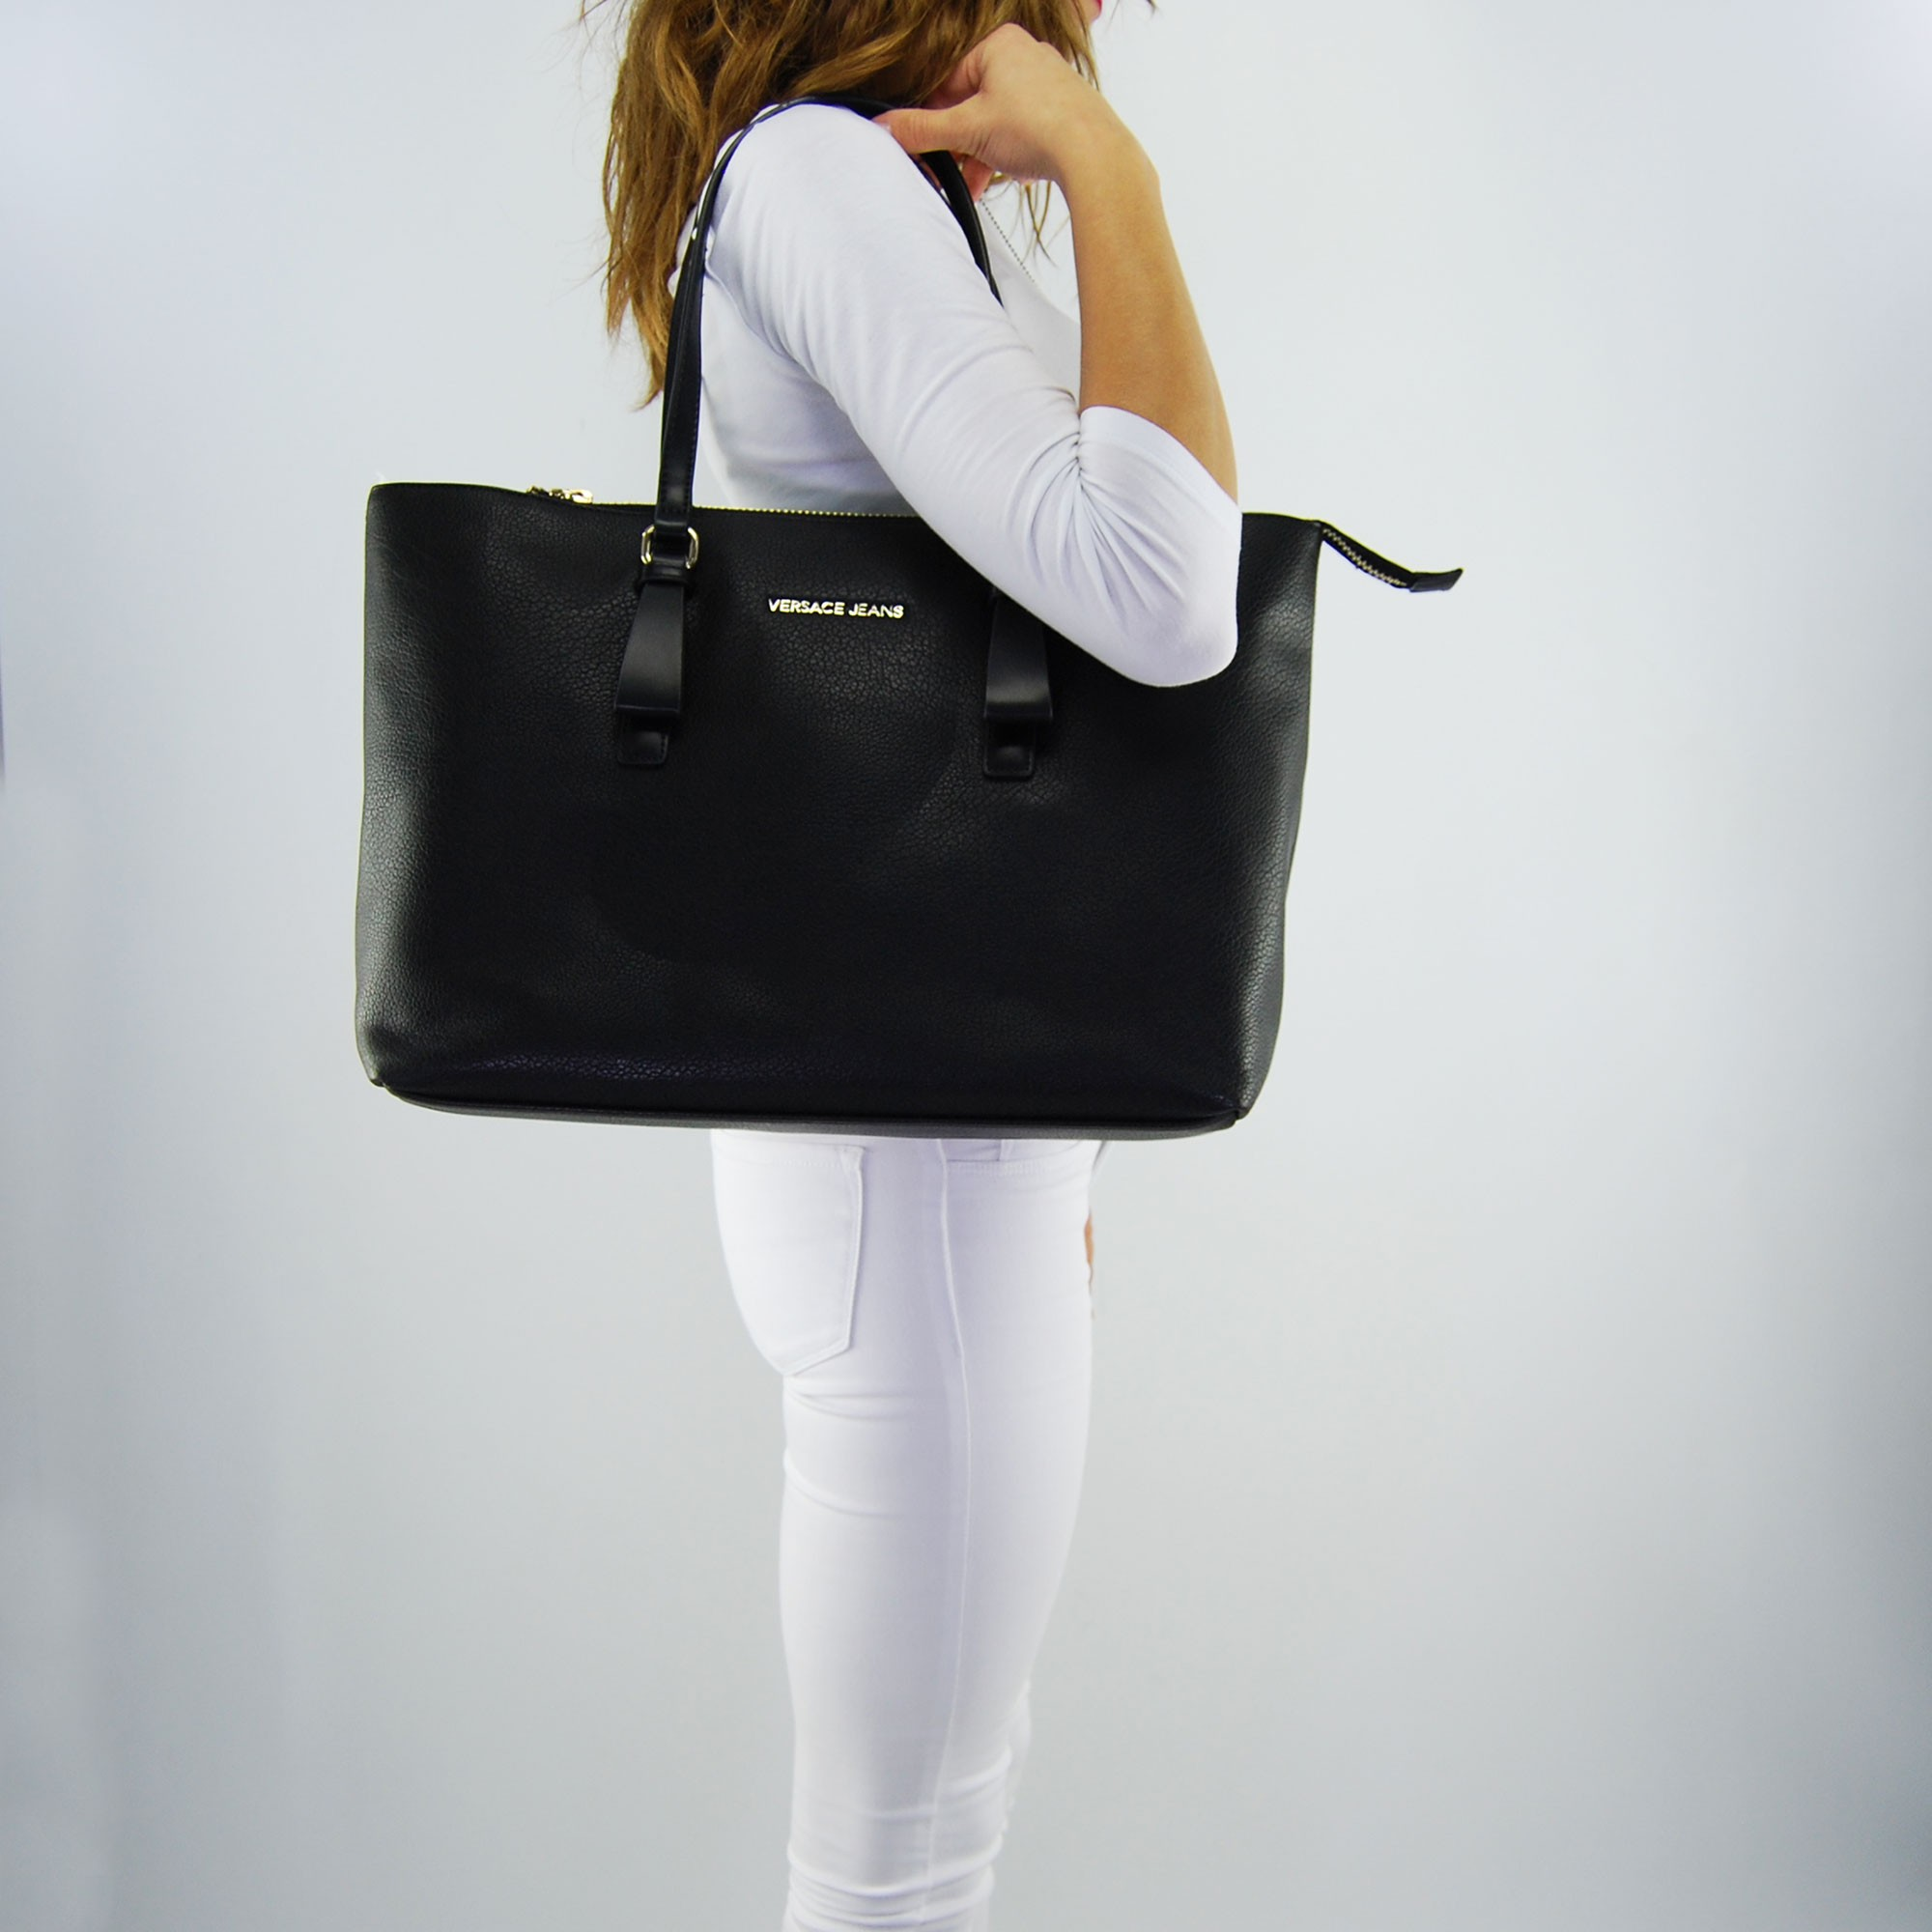 De Jeans Ciervo Compra Versace Suave Bolsa La Negro Grano rCBoWxed